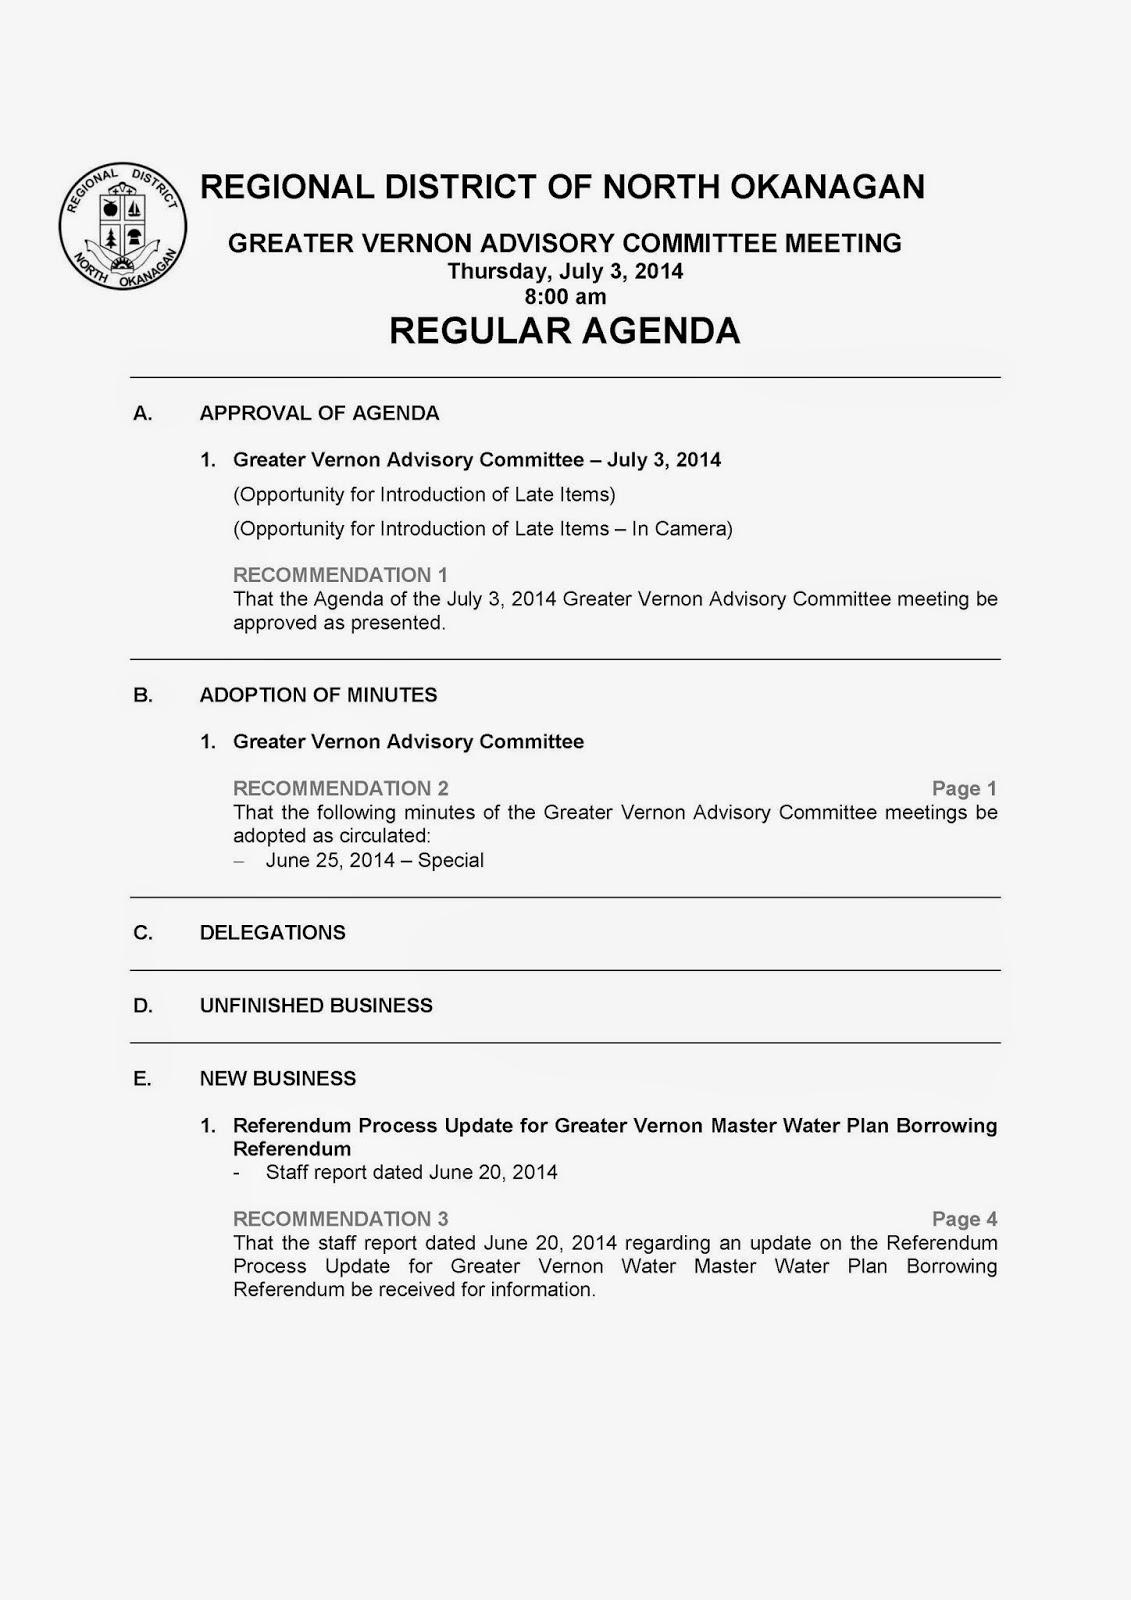 http://www.rdno.ca/agendas/140703_GVAC_AGN_Full.pdf